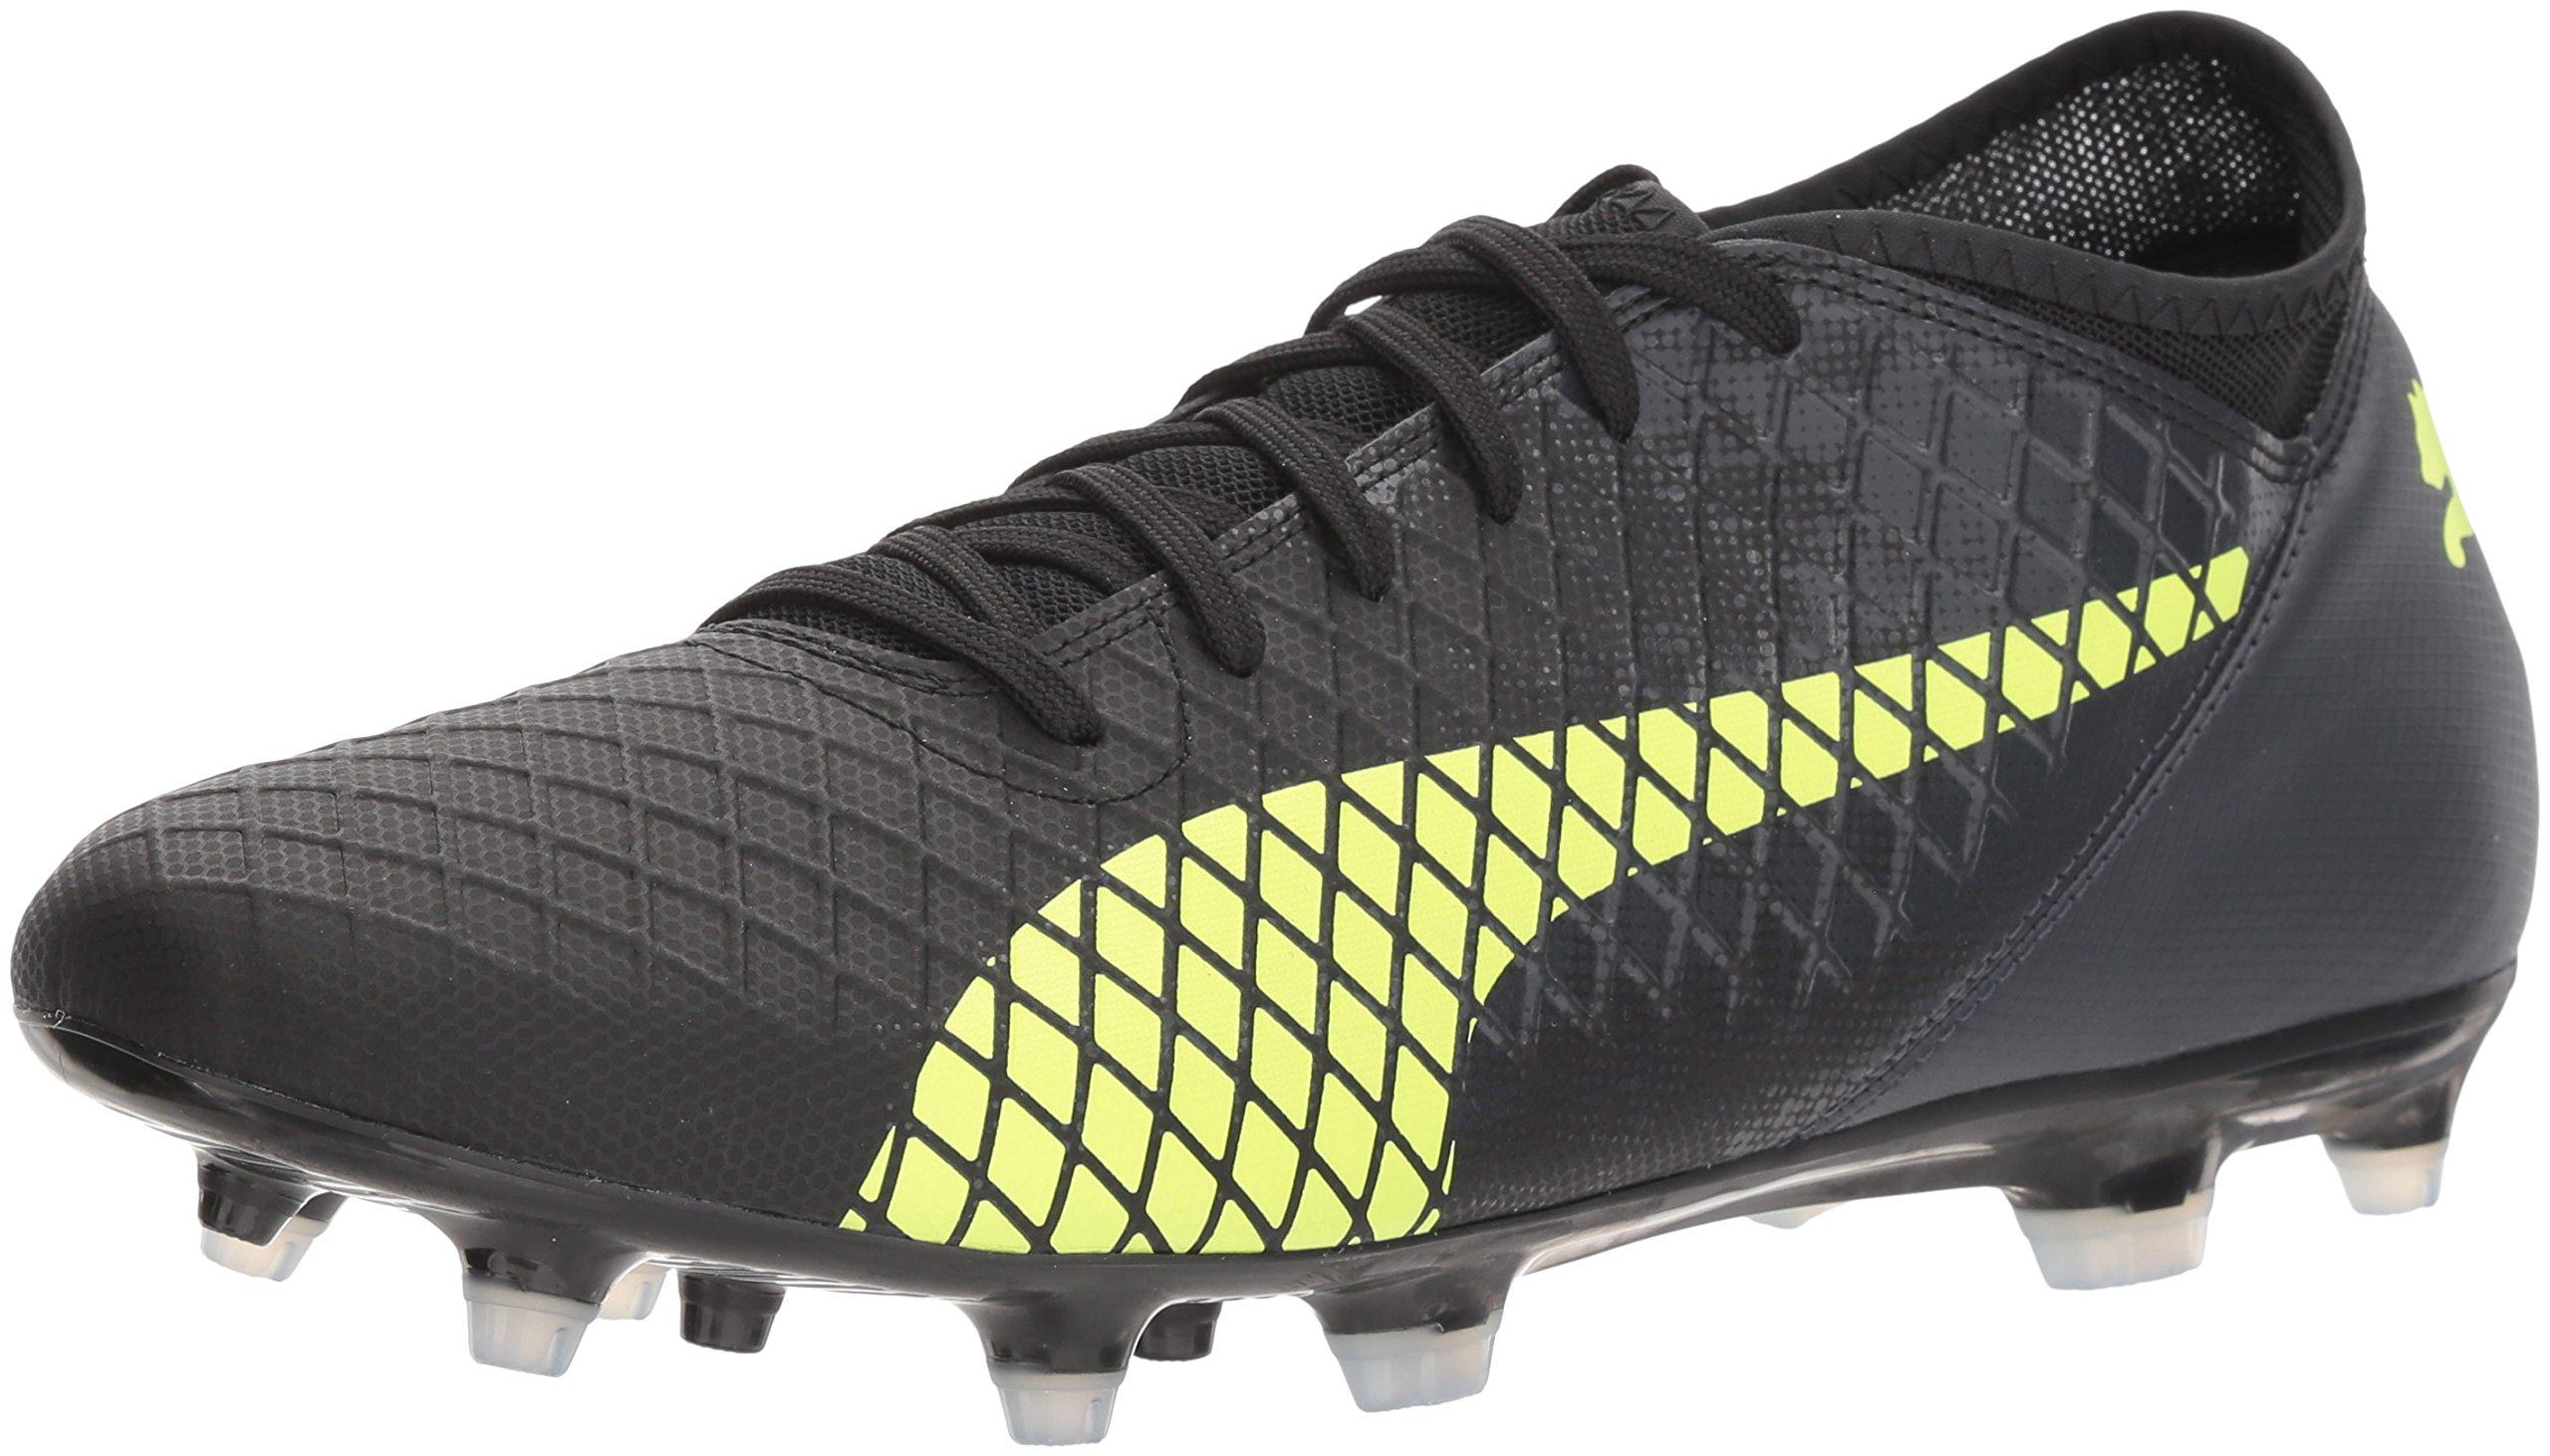 cdb6108252c7 Galleon - PUMA Men's Future 18.4 FG/AG Soccer-Shoes, Puma Black-Fizzy  Yellow-Asphalt, 7.5 M US